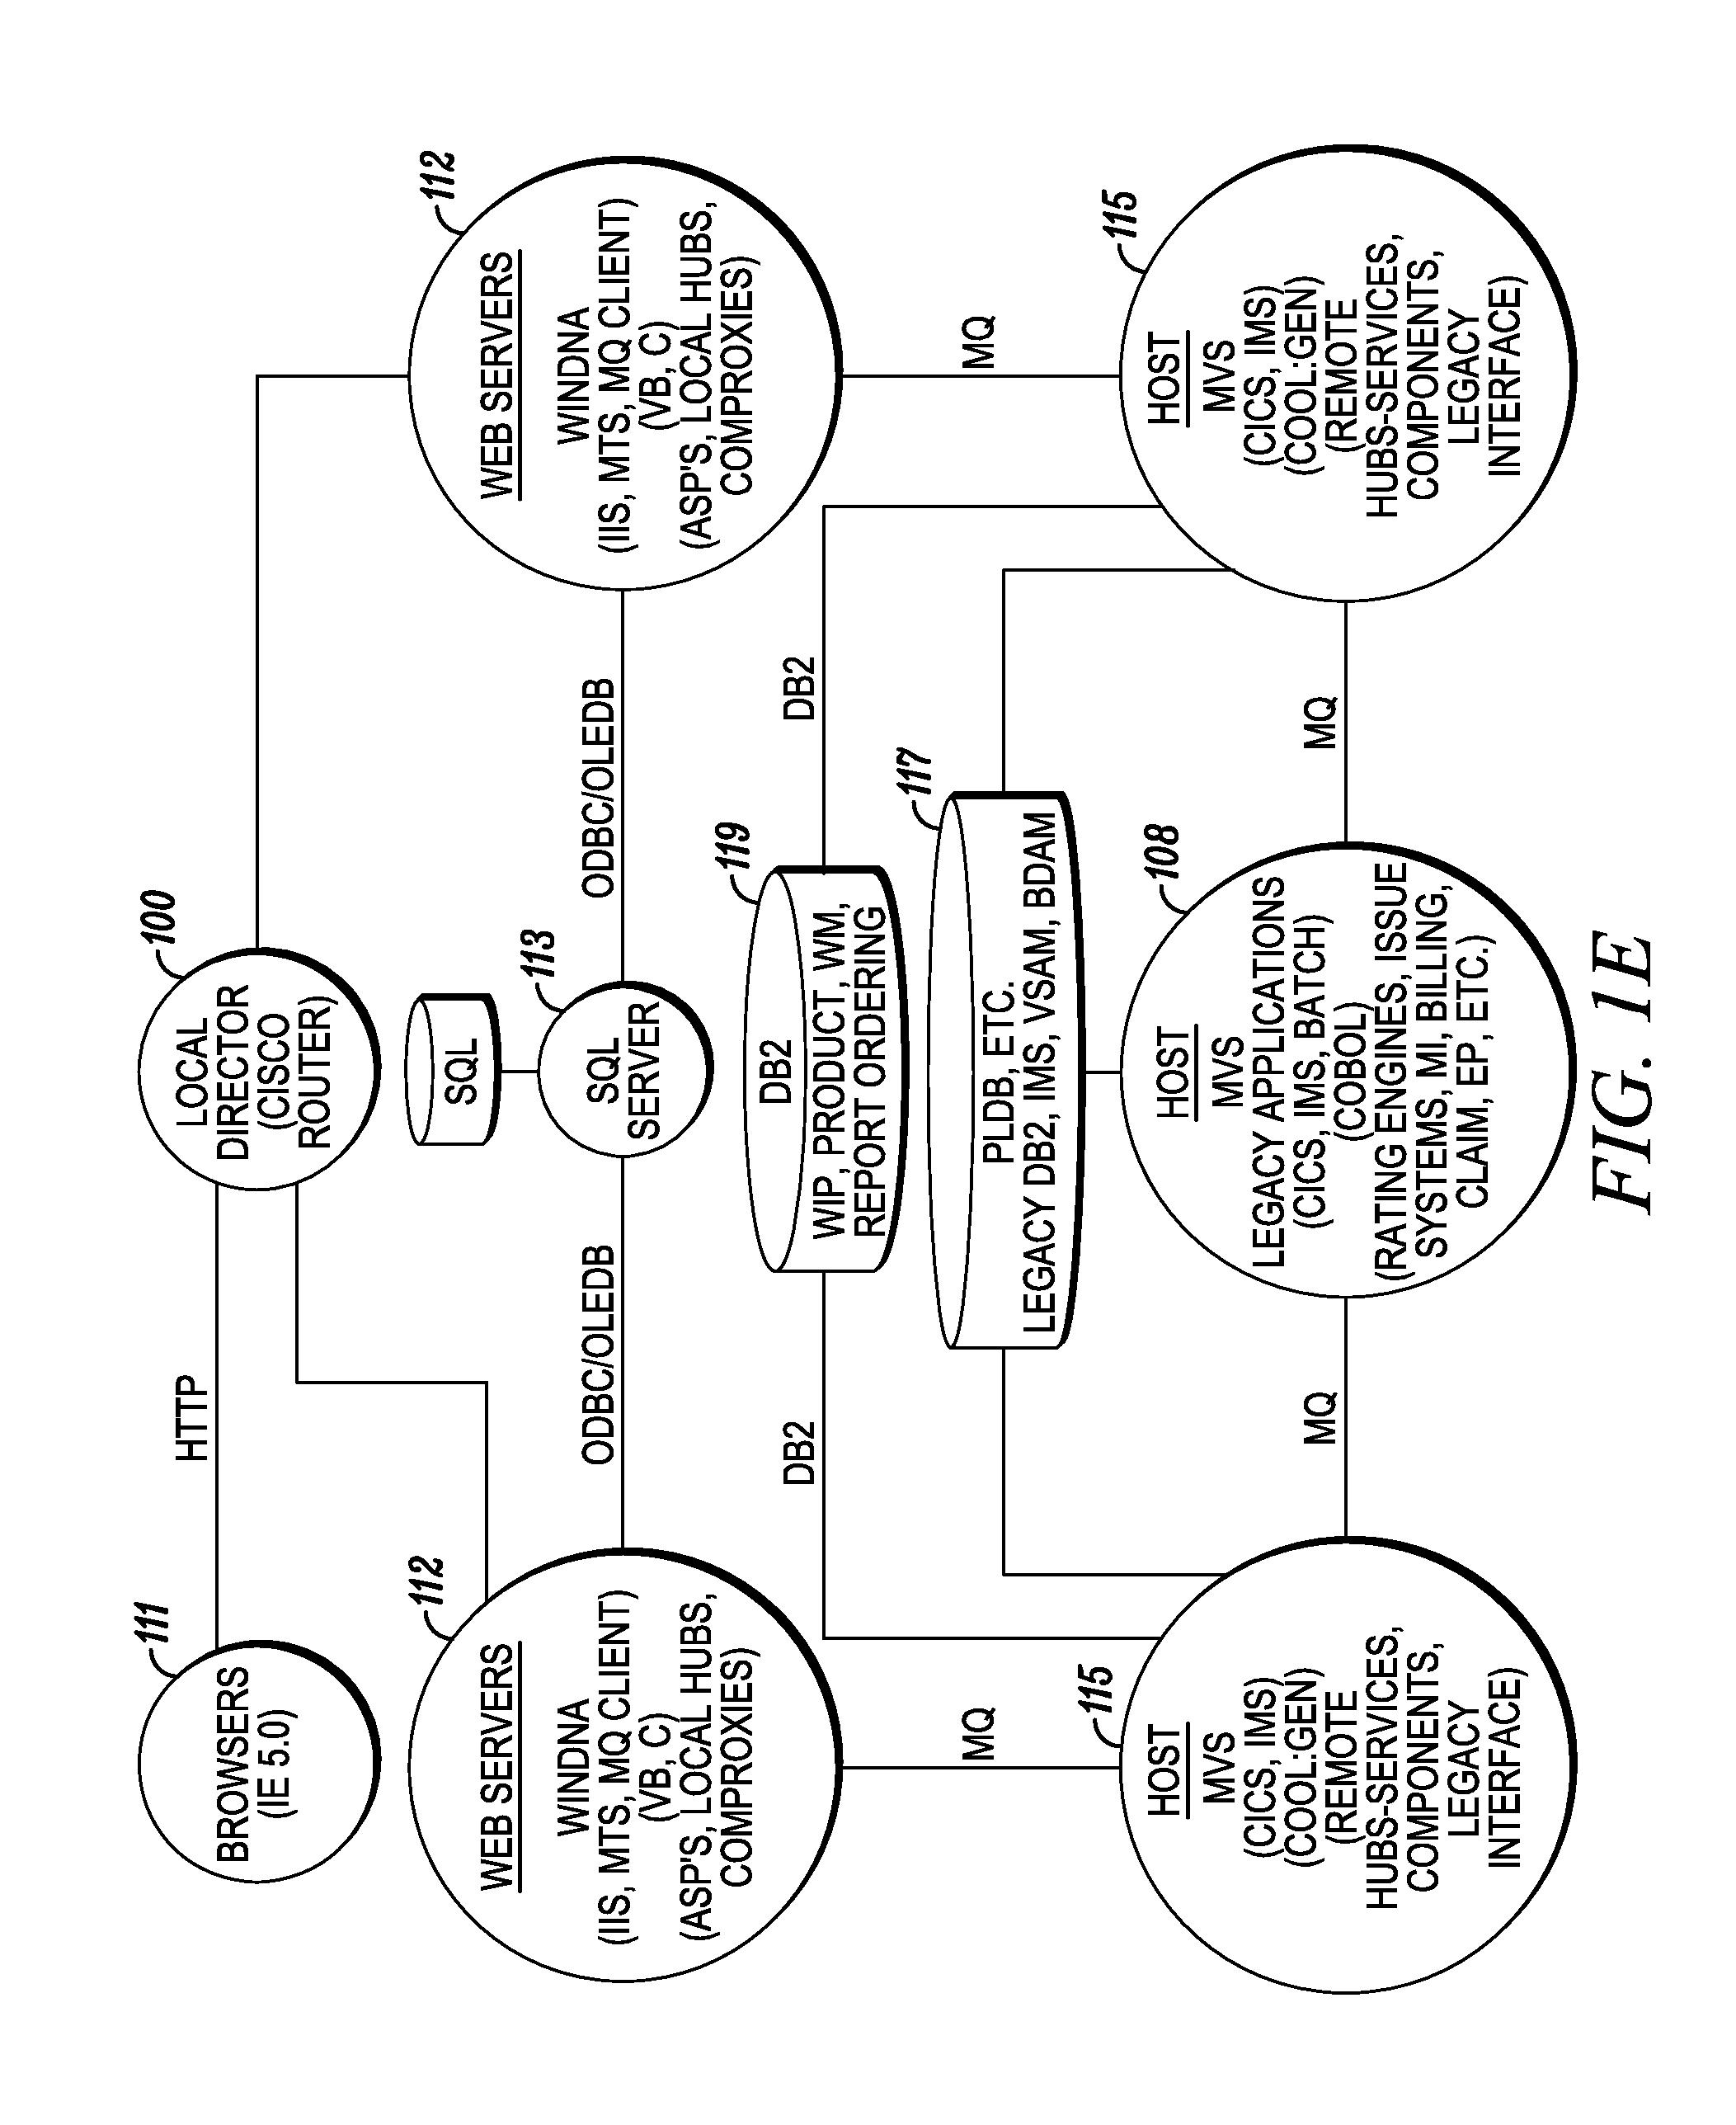 patent us 8 041 617 b1 City Manager Resume patent